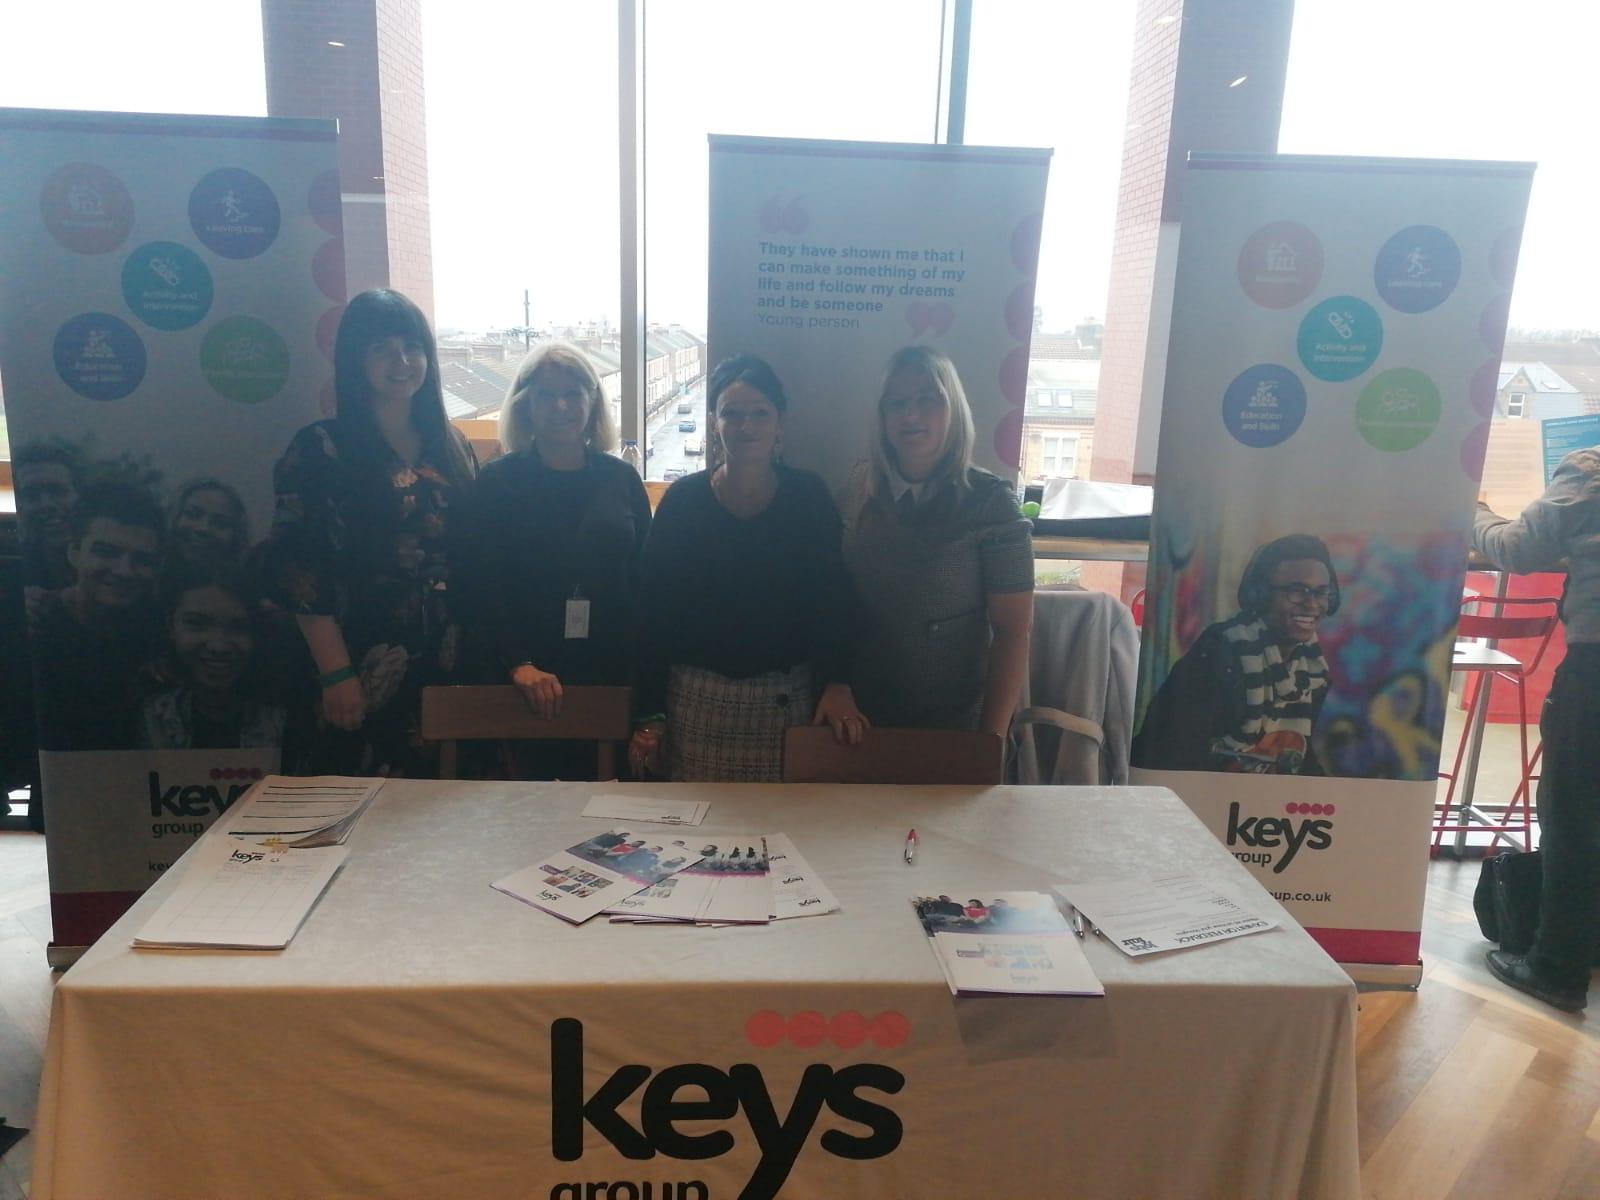 Keys Group